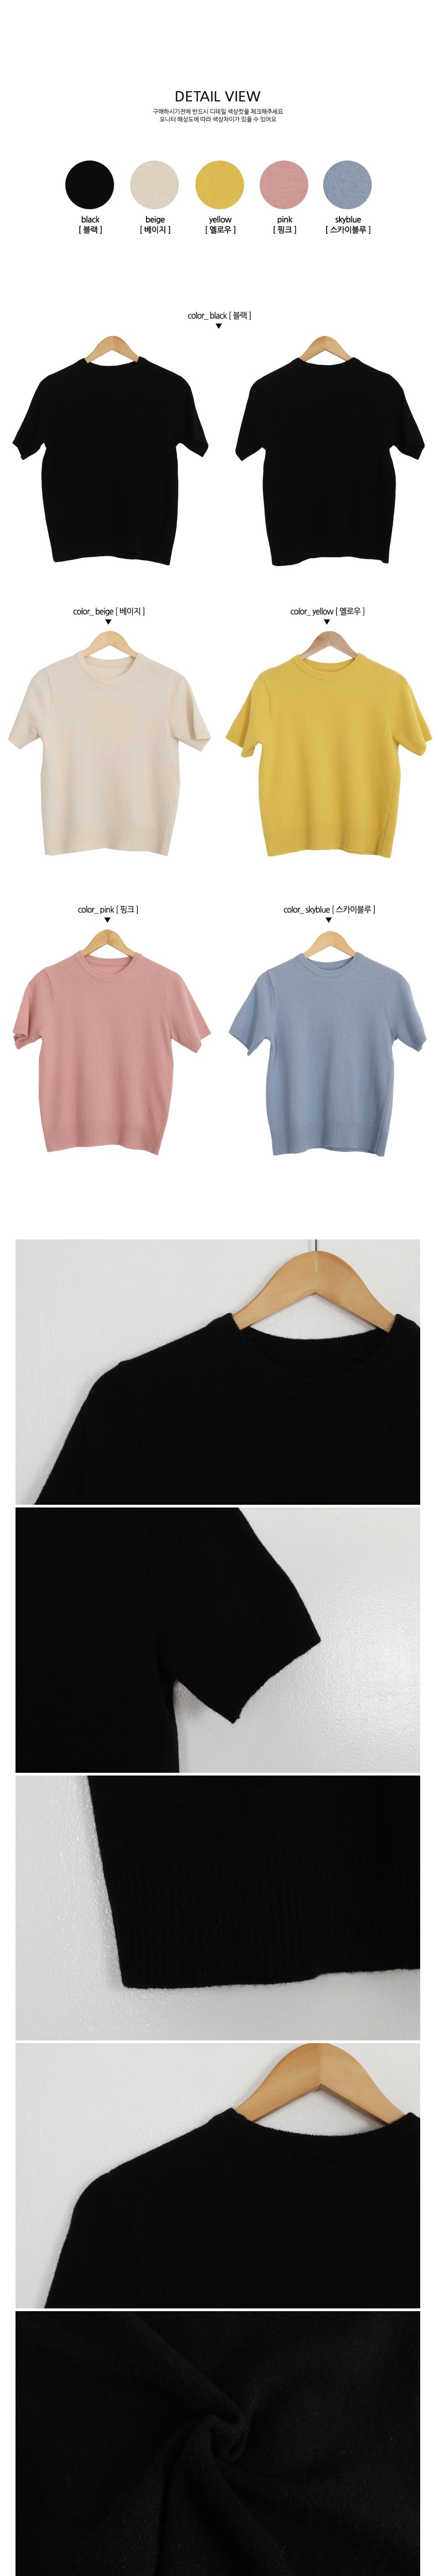 Cashmere Short Sleeve Knit-Spring Spring Short Sleeve Knitwear